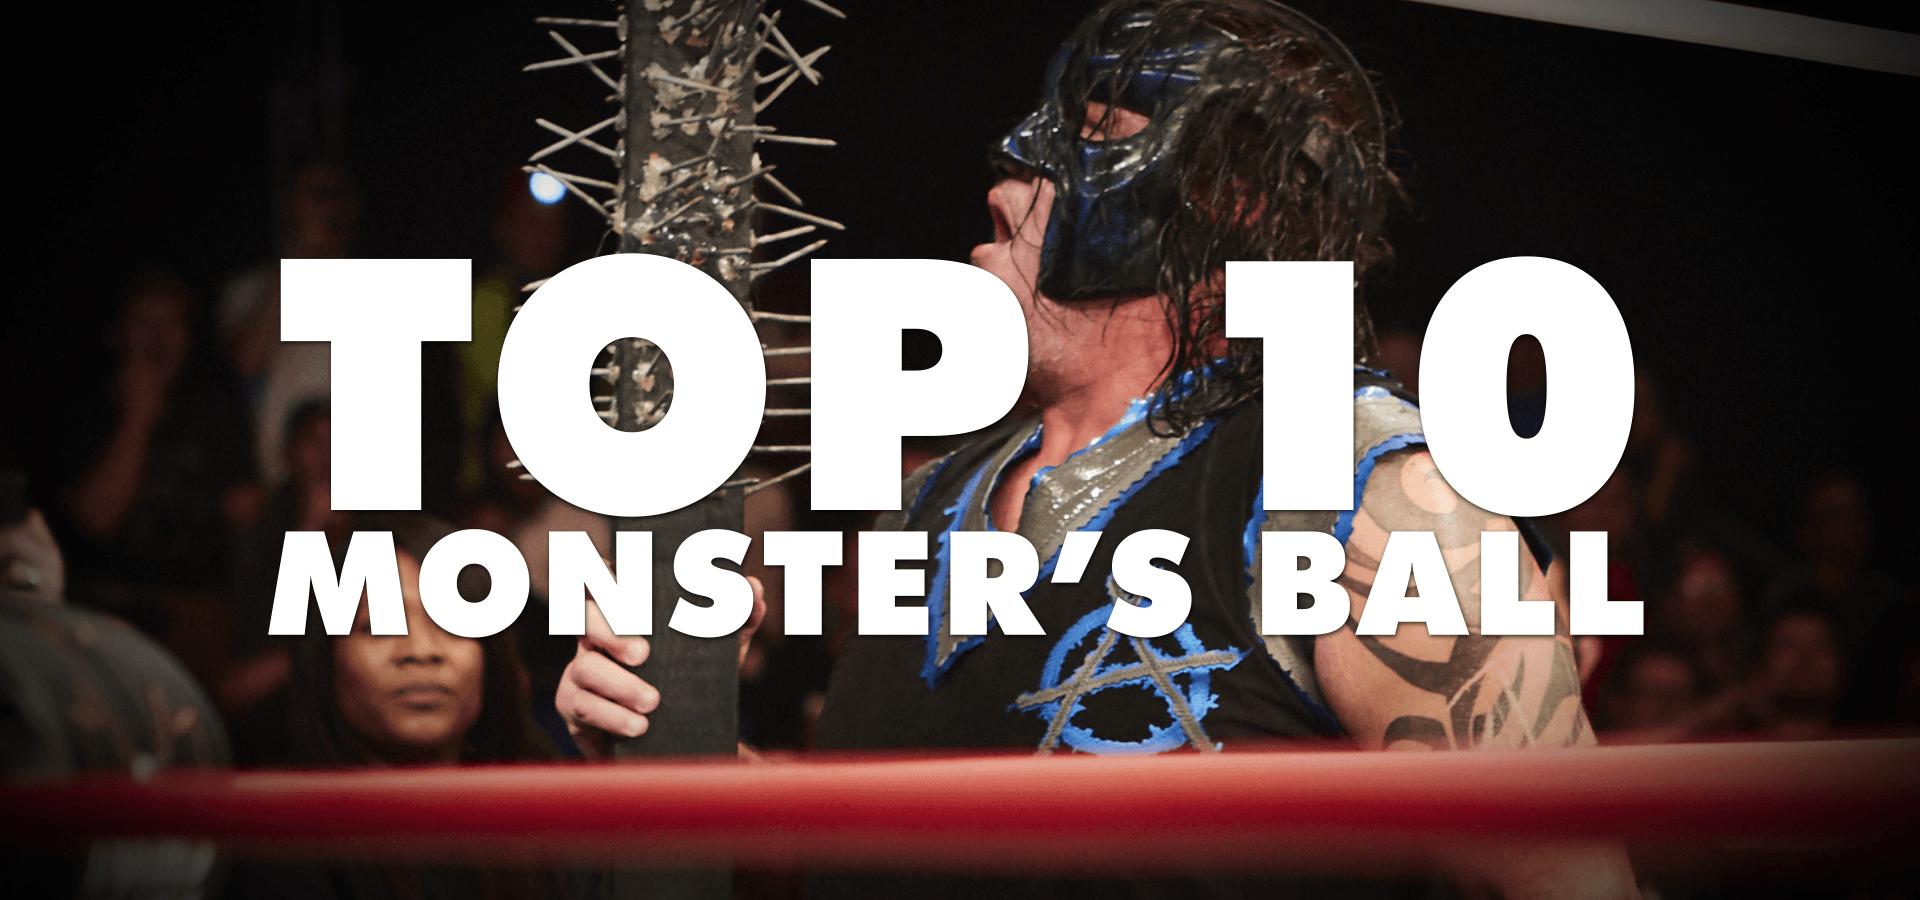 Top 10 Monster's Ball